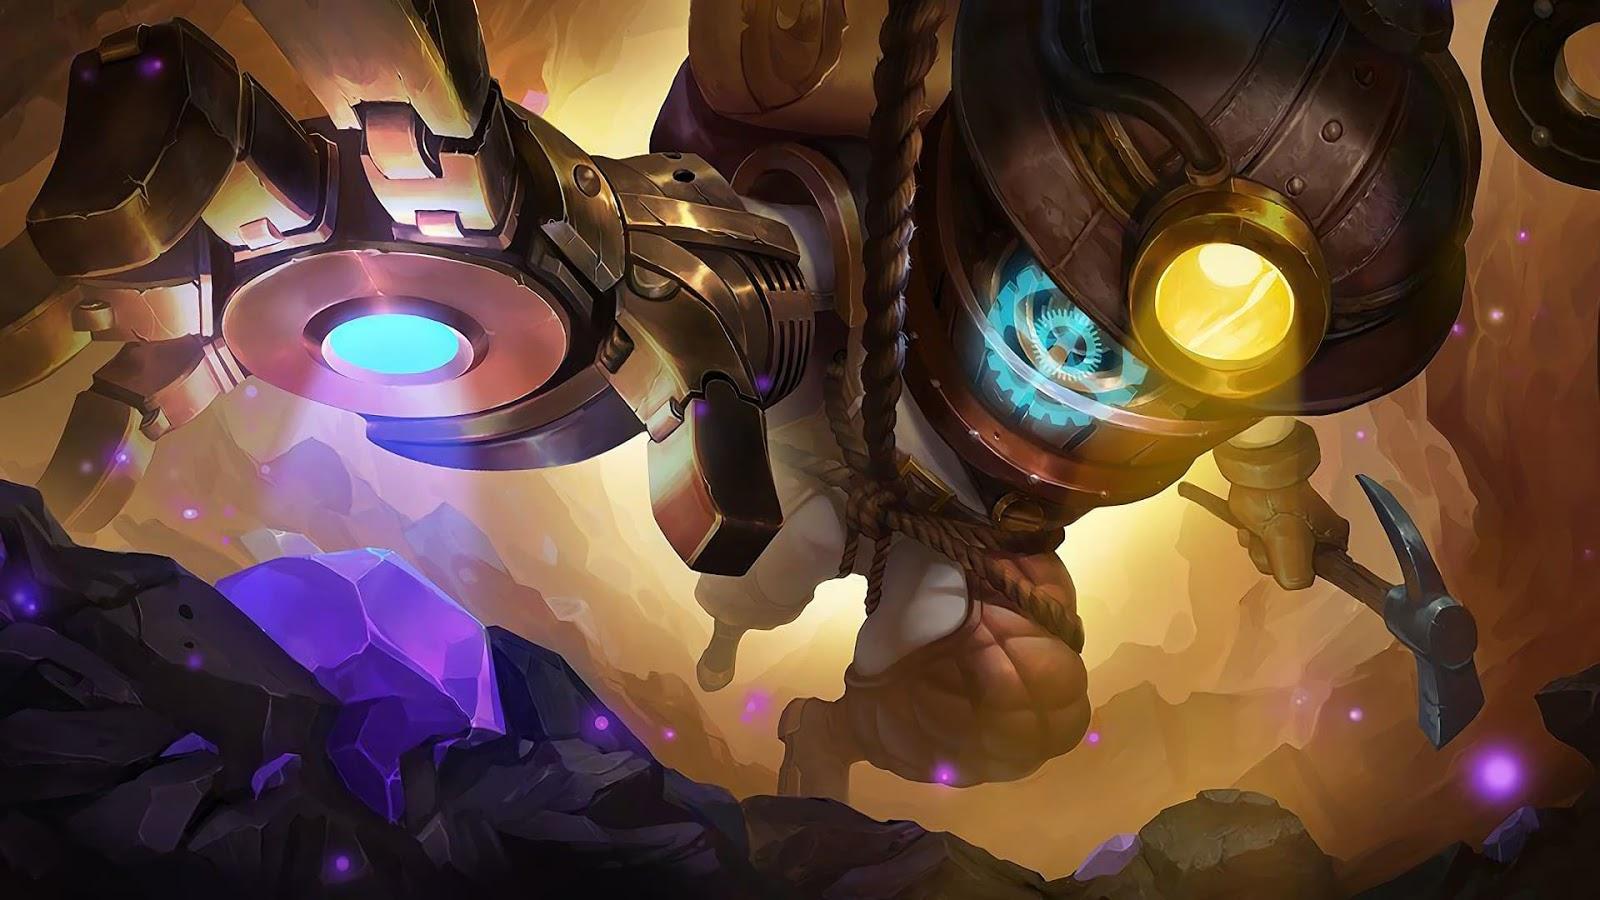 Wallpaper Cyclops Super Adventurer Skin Mobile Legends HD for PC